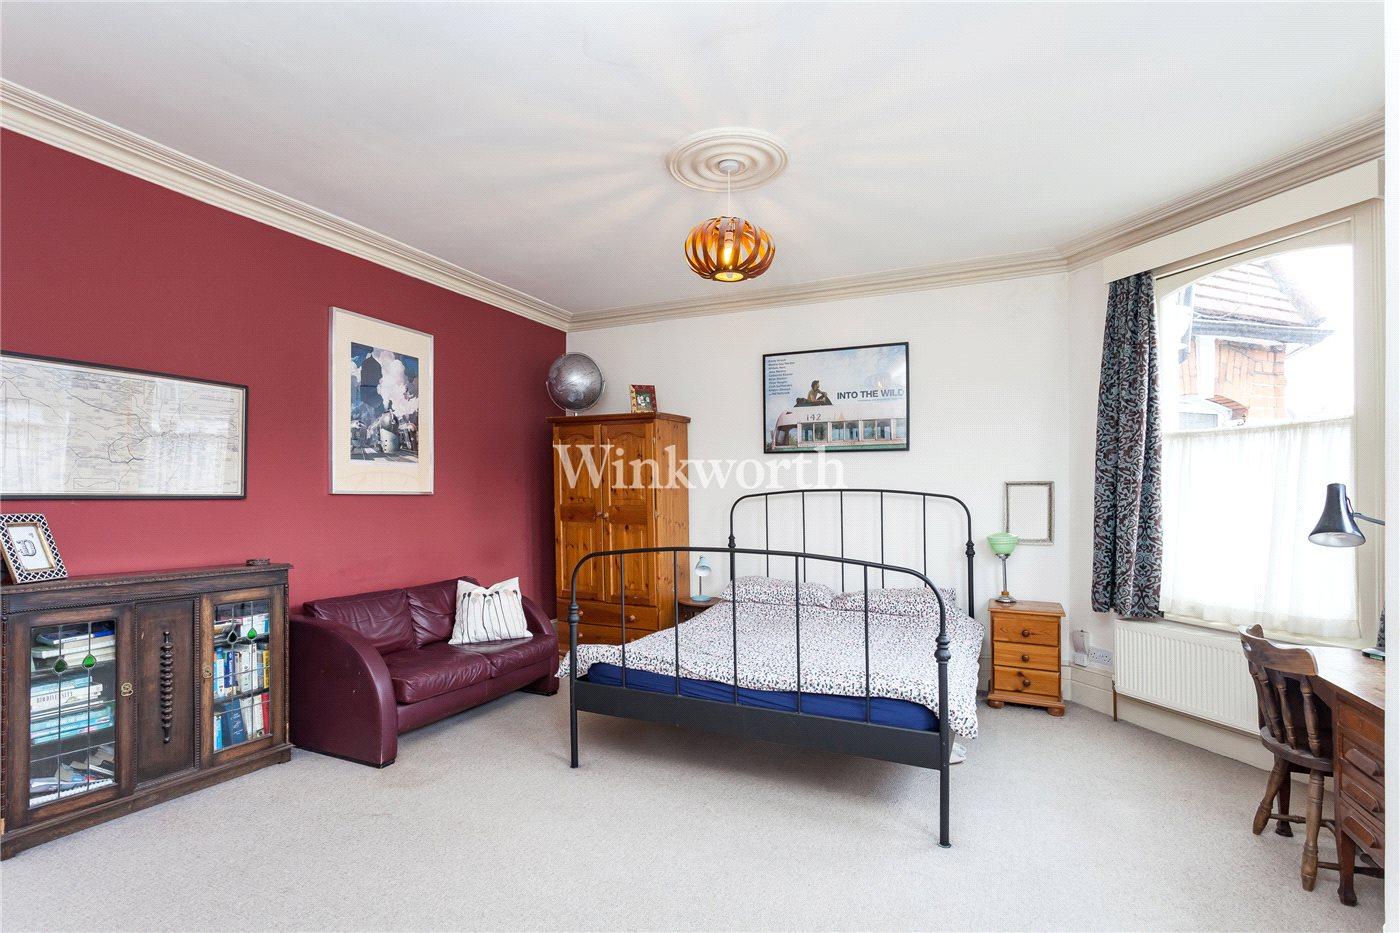 3 Bedroom Property For Sale In Mattison Road Harringay